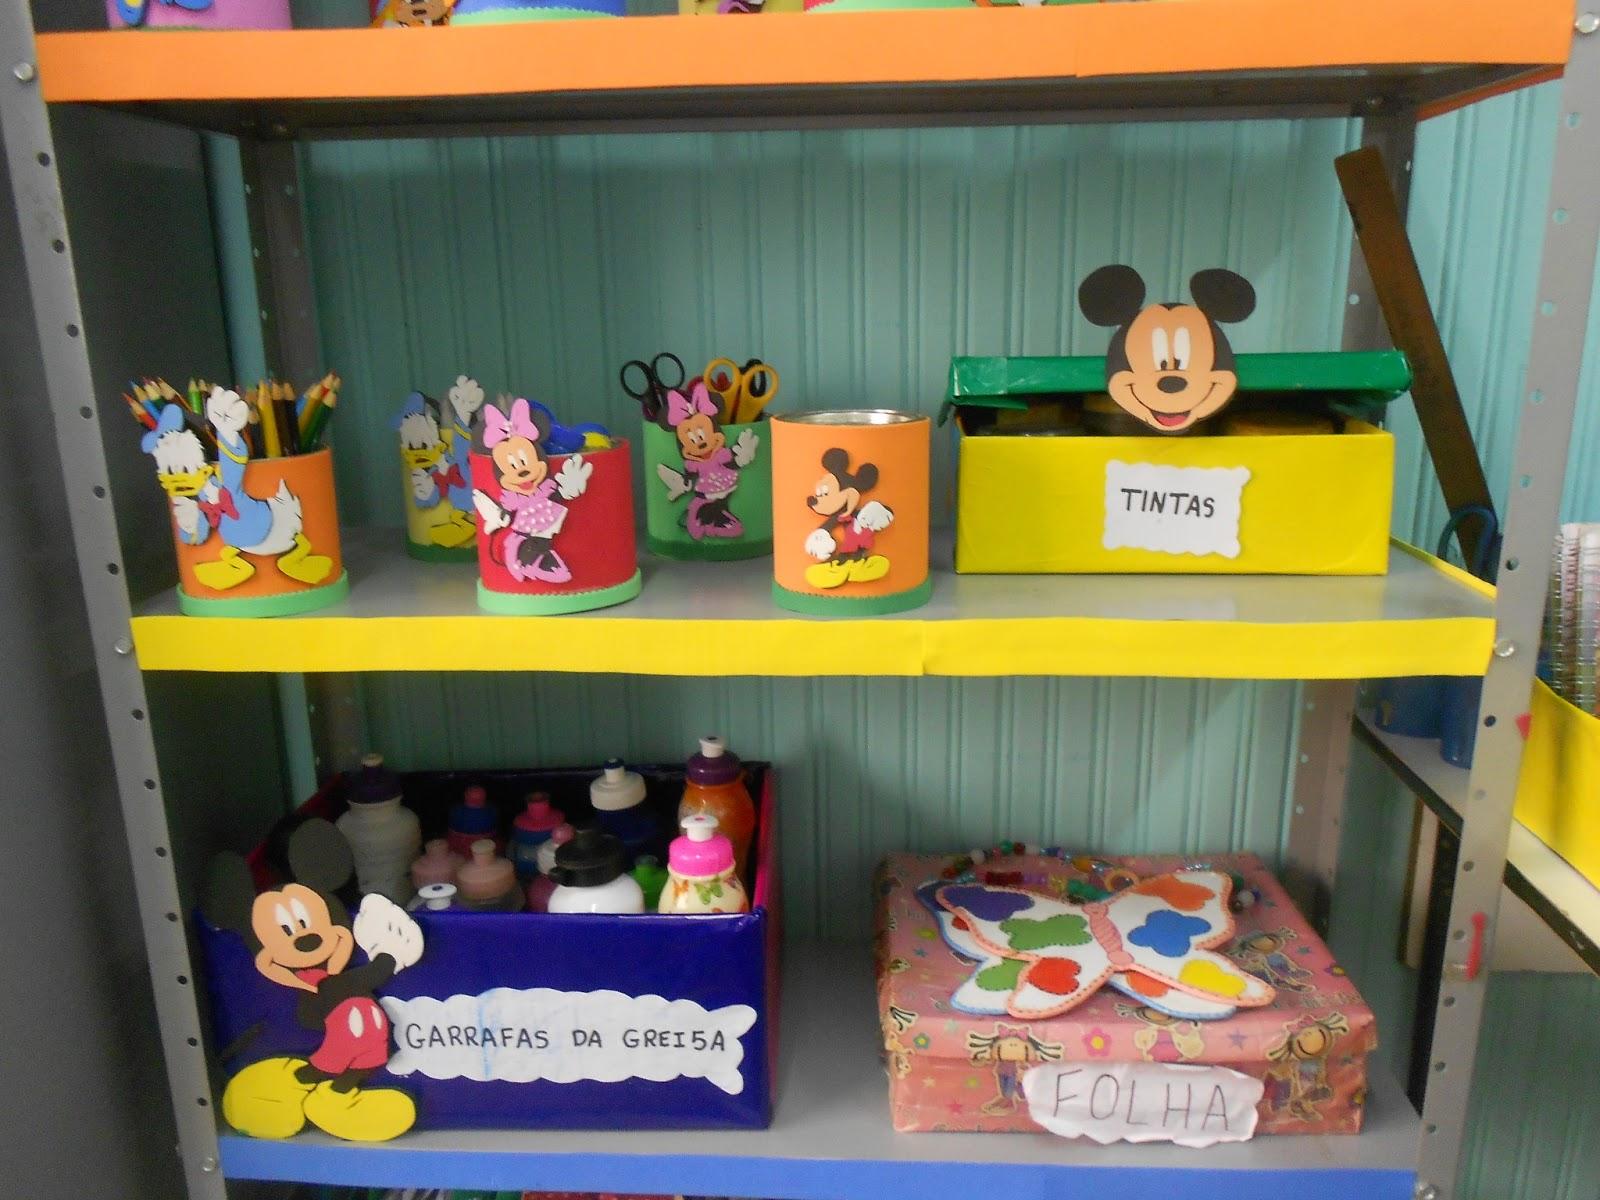 decoracao de sala aula educacao infantil: DANY Educação Infantil: Decoração da minha sala de aula